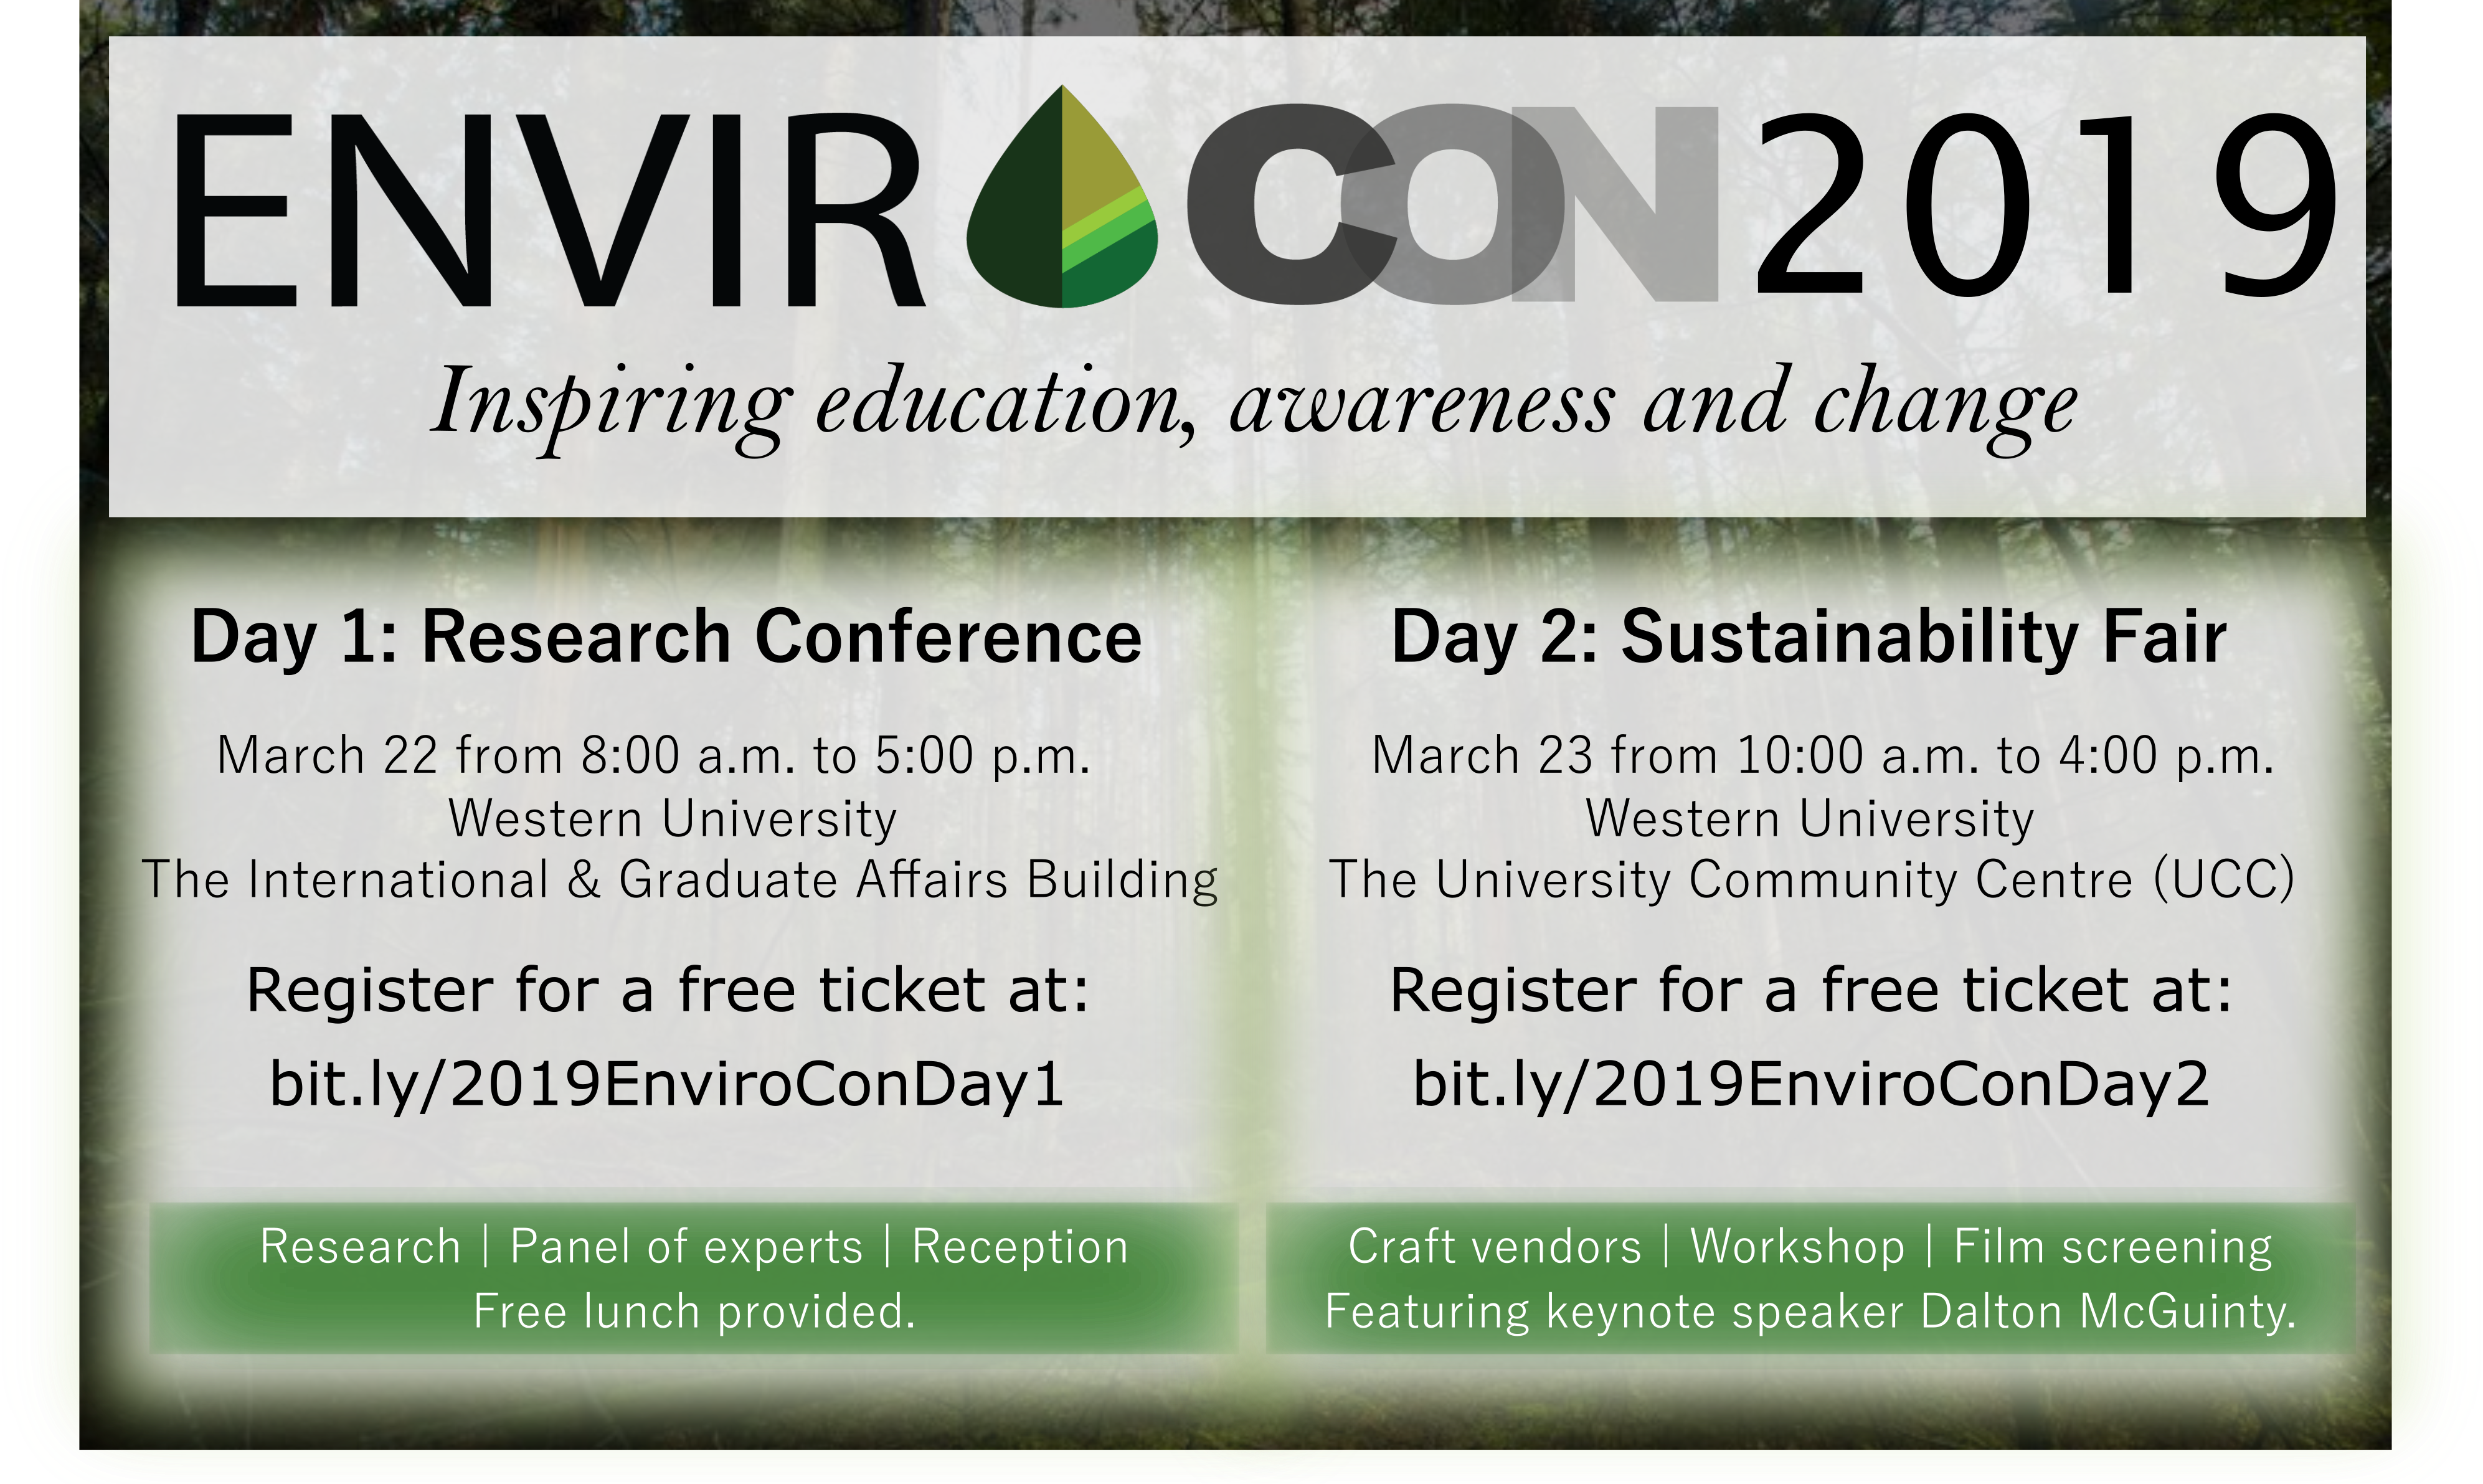 EnviroCon 2019 - London Environmental Network